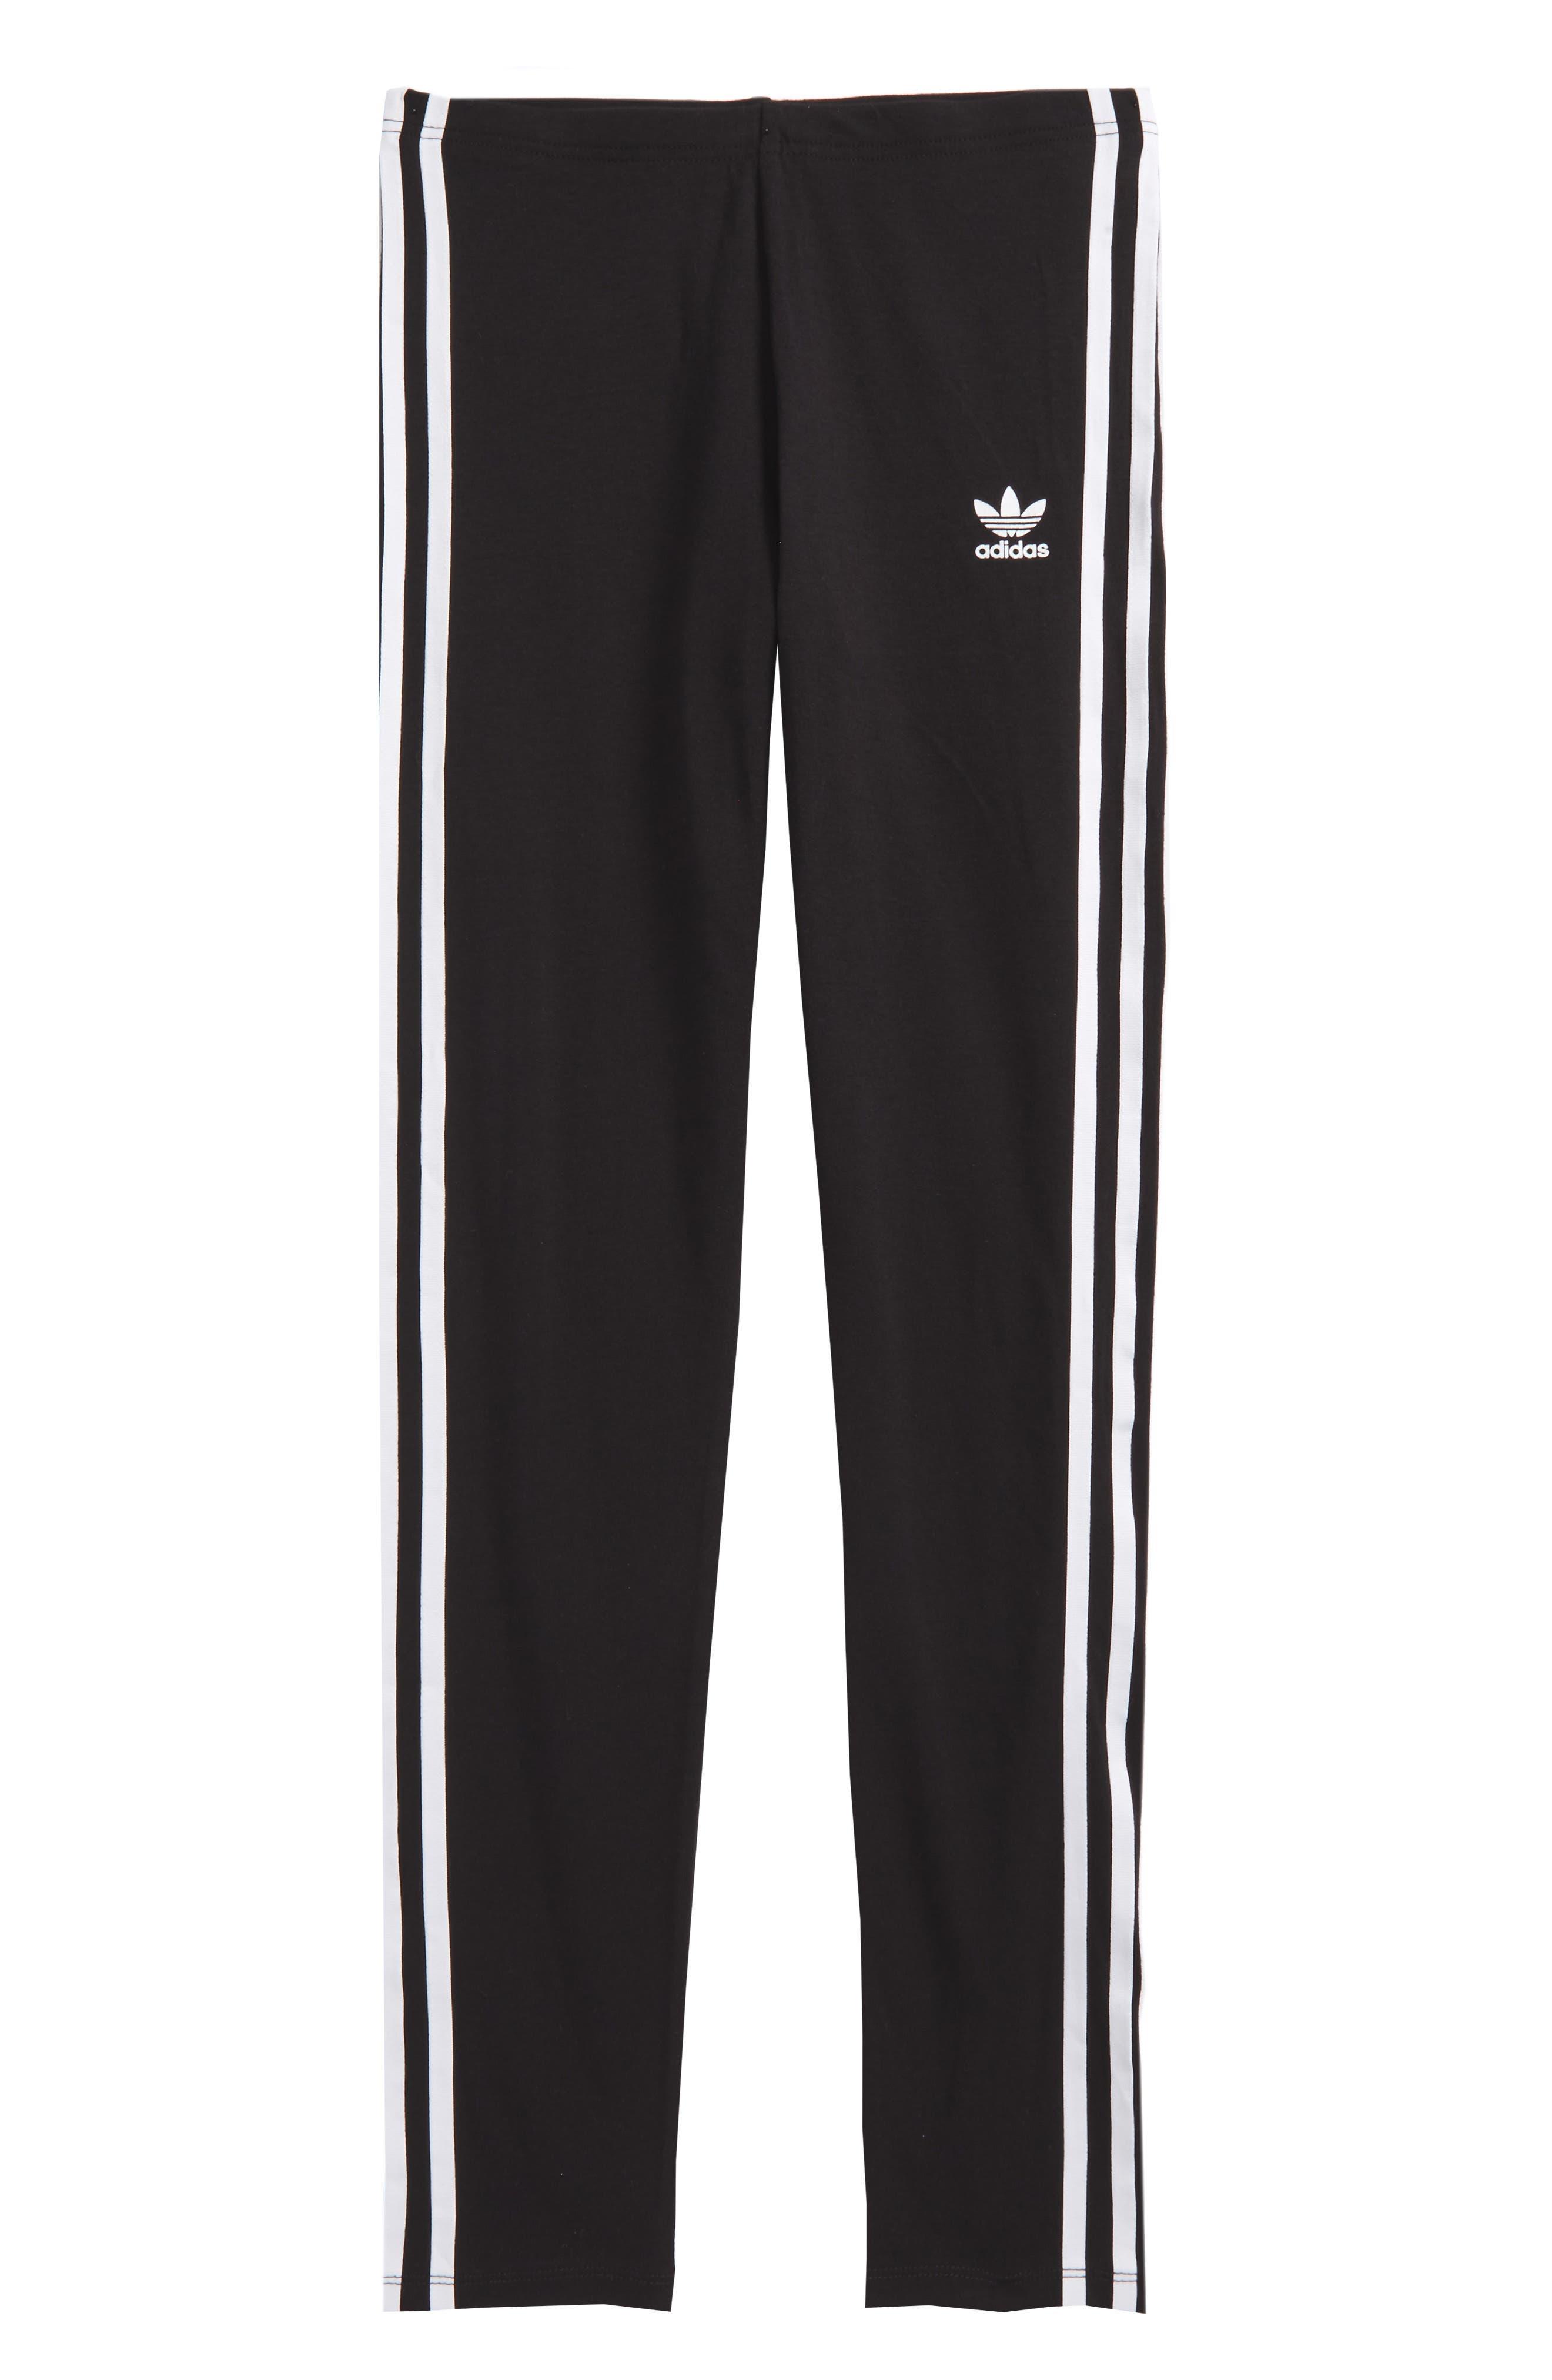 adidas 3-Stripes Leggings,                             Main thumbnail 1, color,                             Black / White